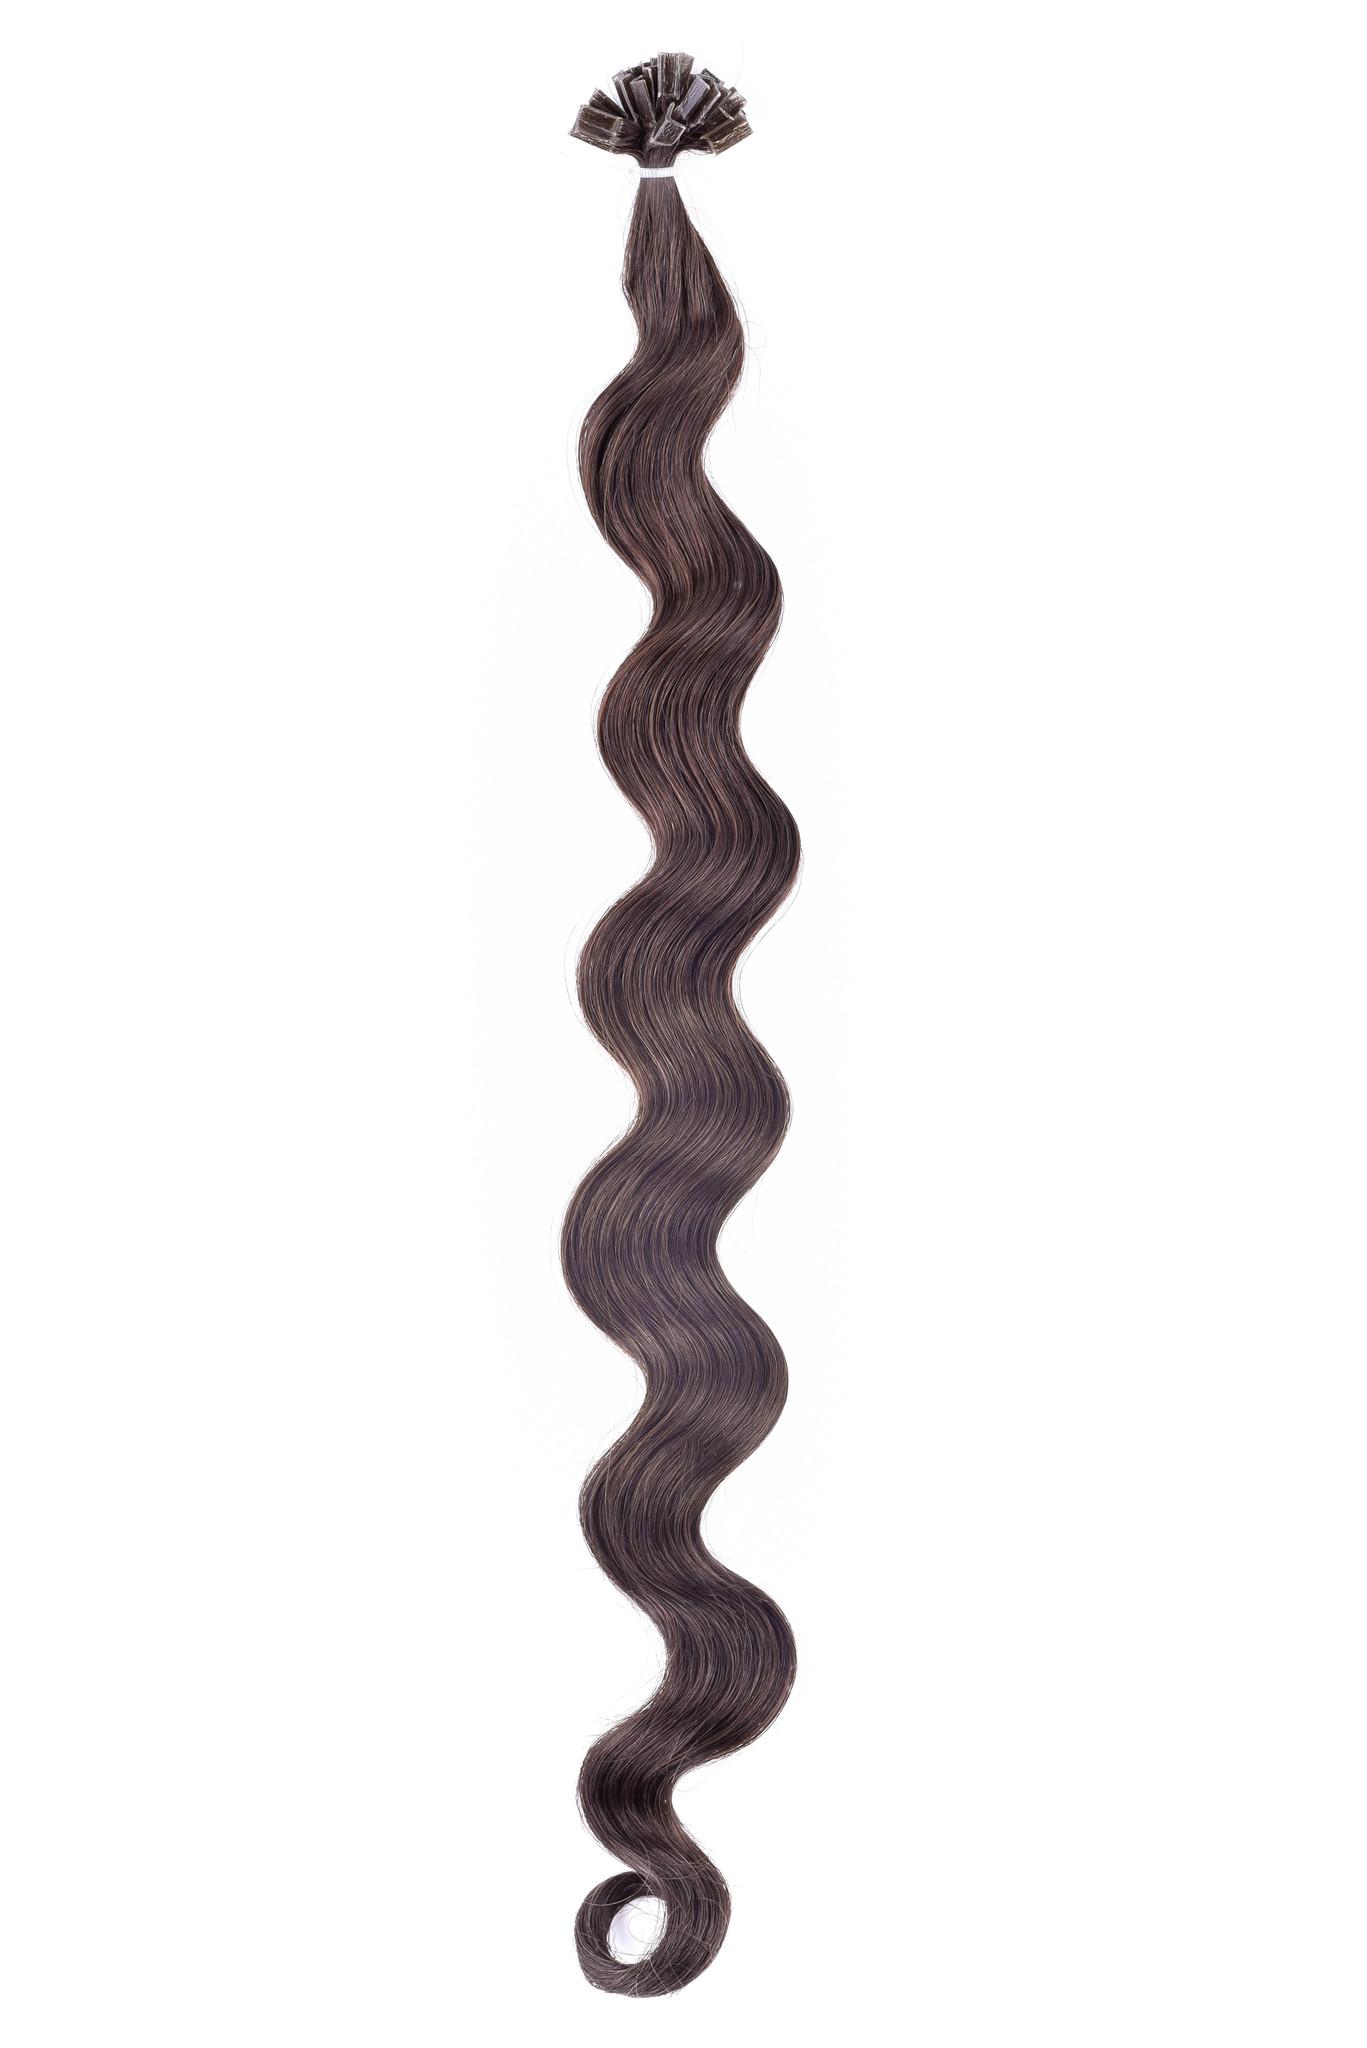 SilverFox Wax Extensions Loose Wave 55cm  #1 Jet Black